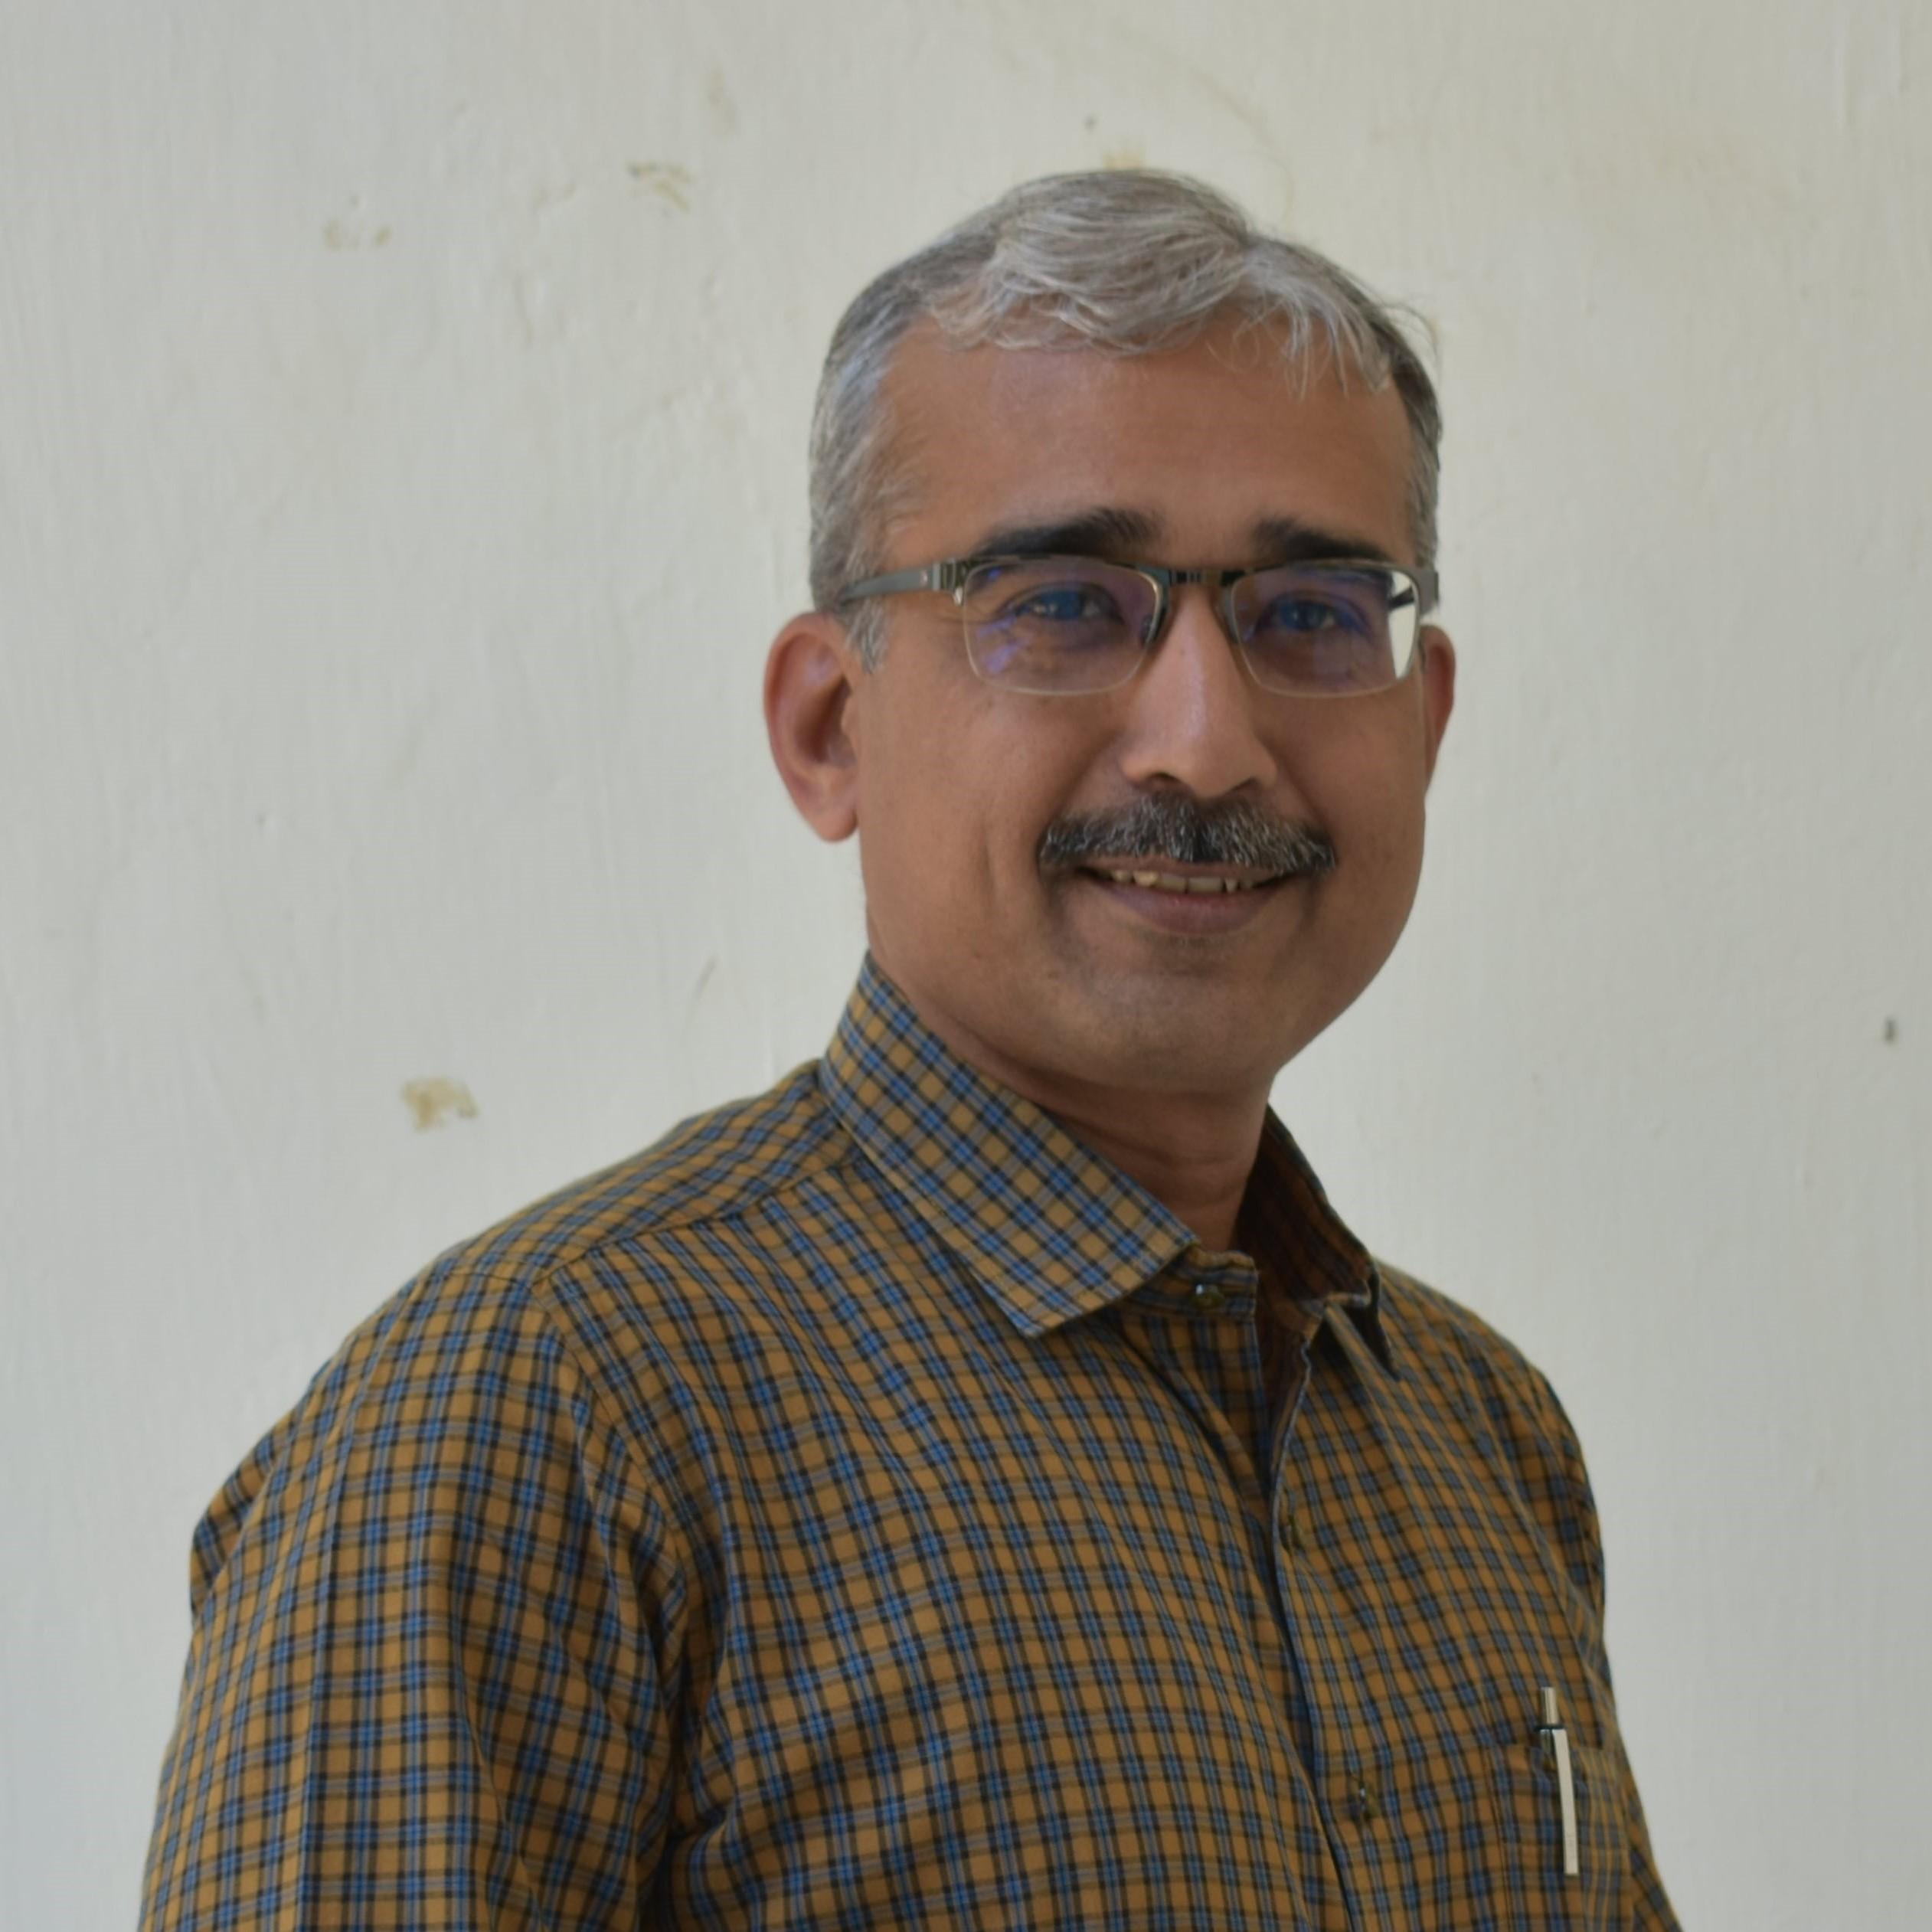 Dr. Pragneshkumar N. Panchal